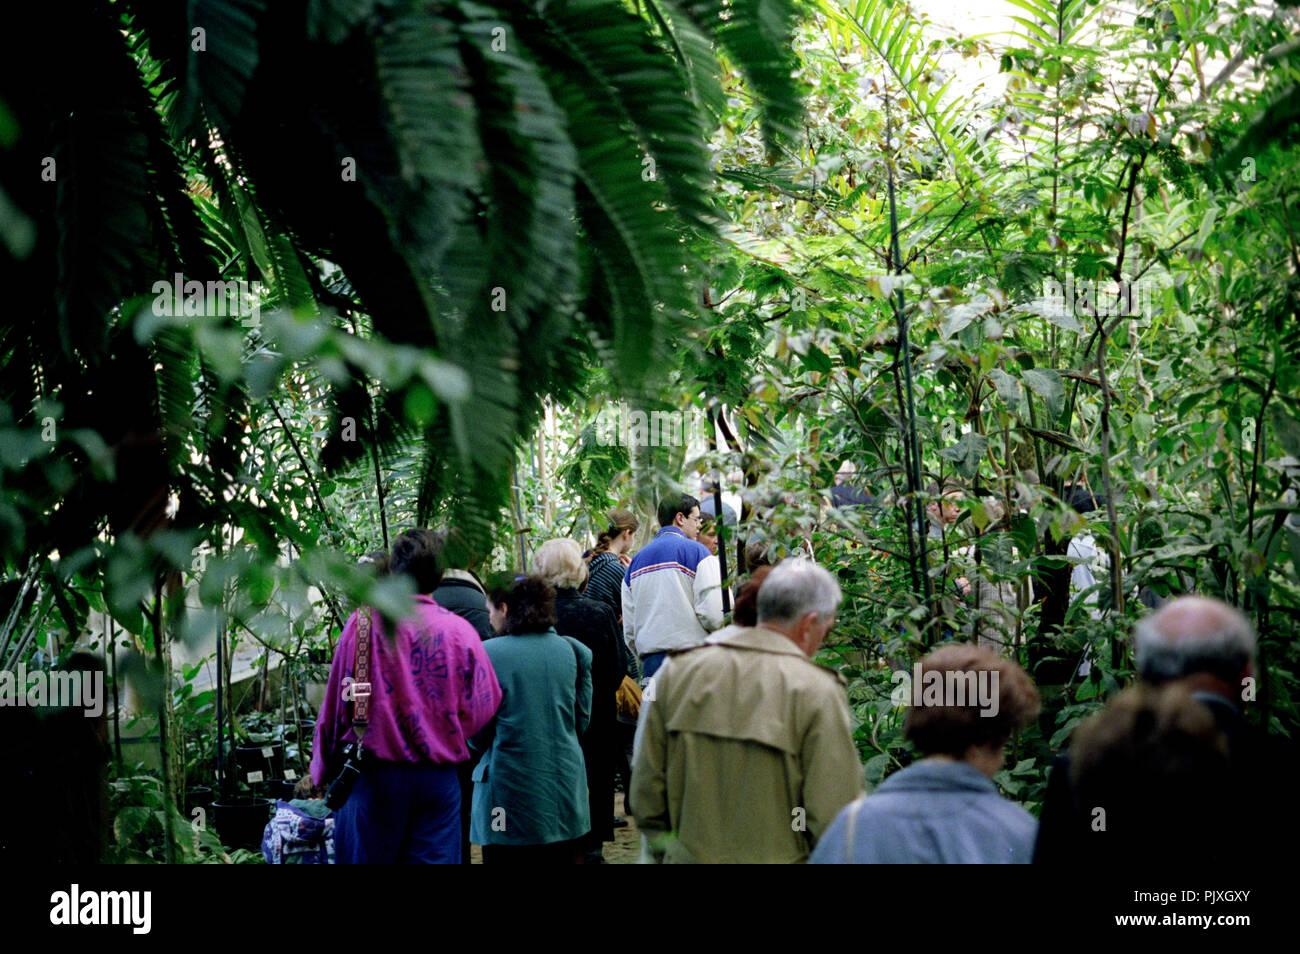 The National Botanic Garden of Belgium in Meise (Belgium, 05/1992) - Stock Image